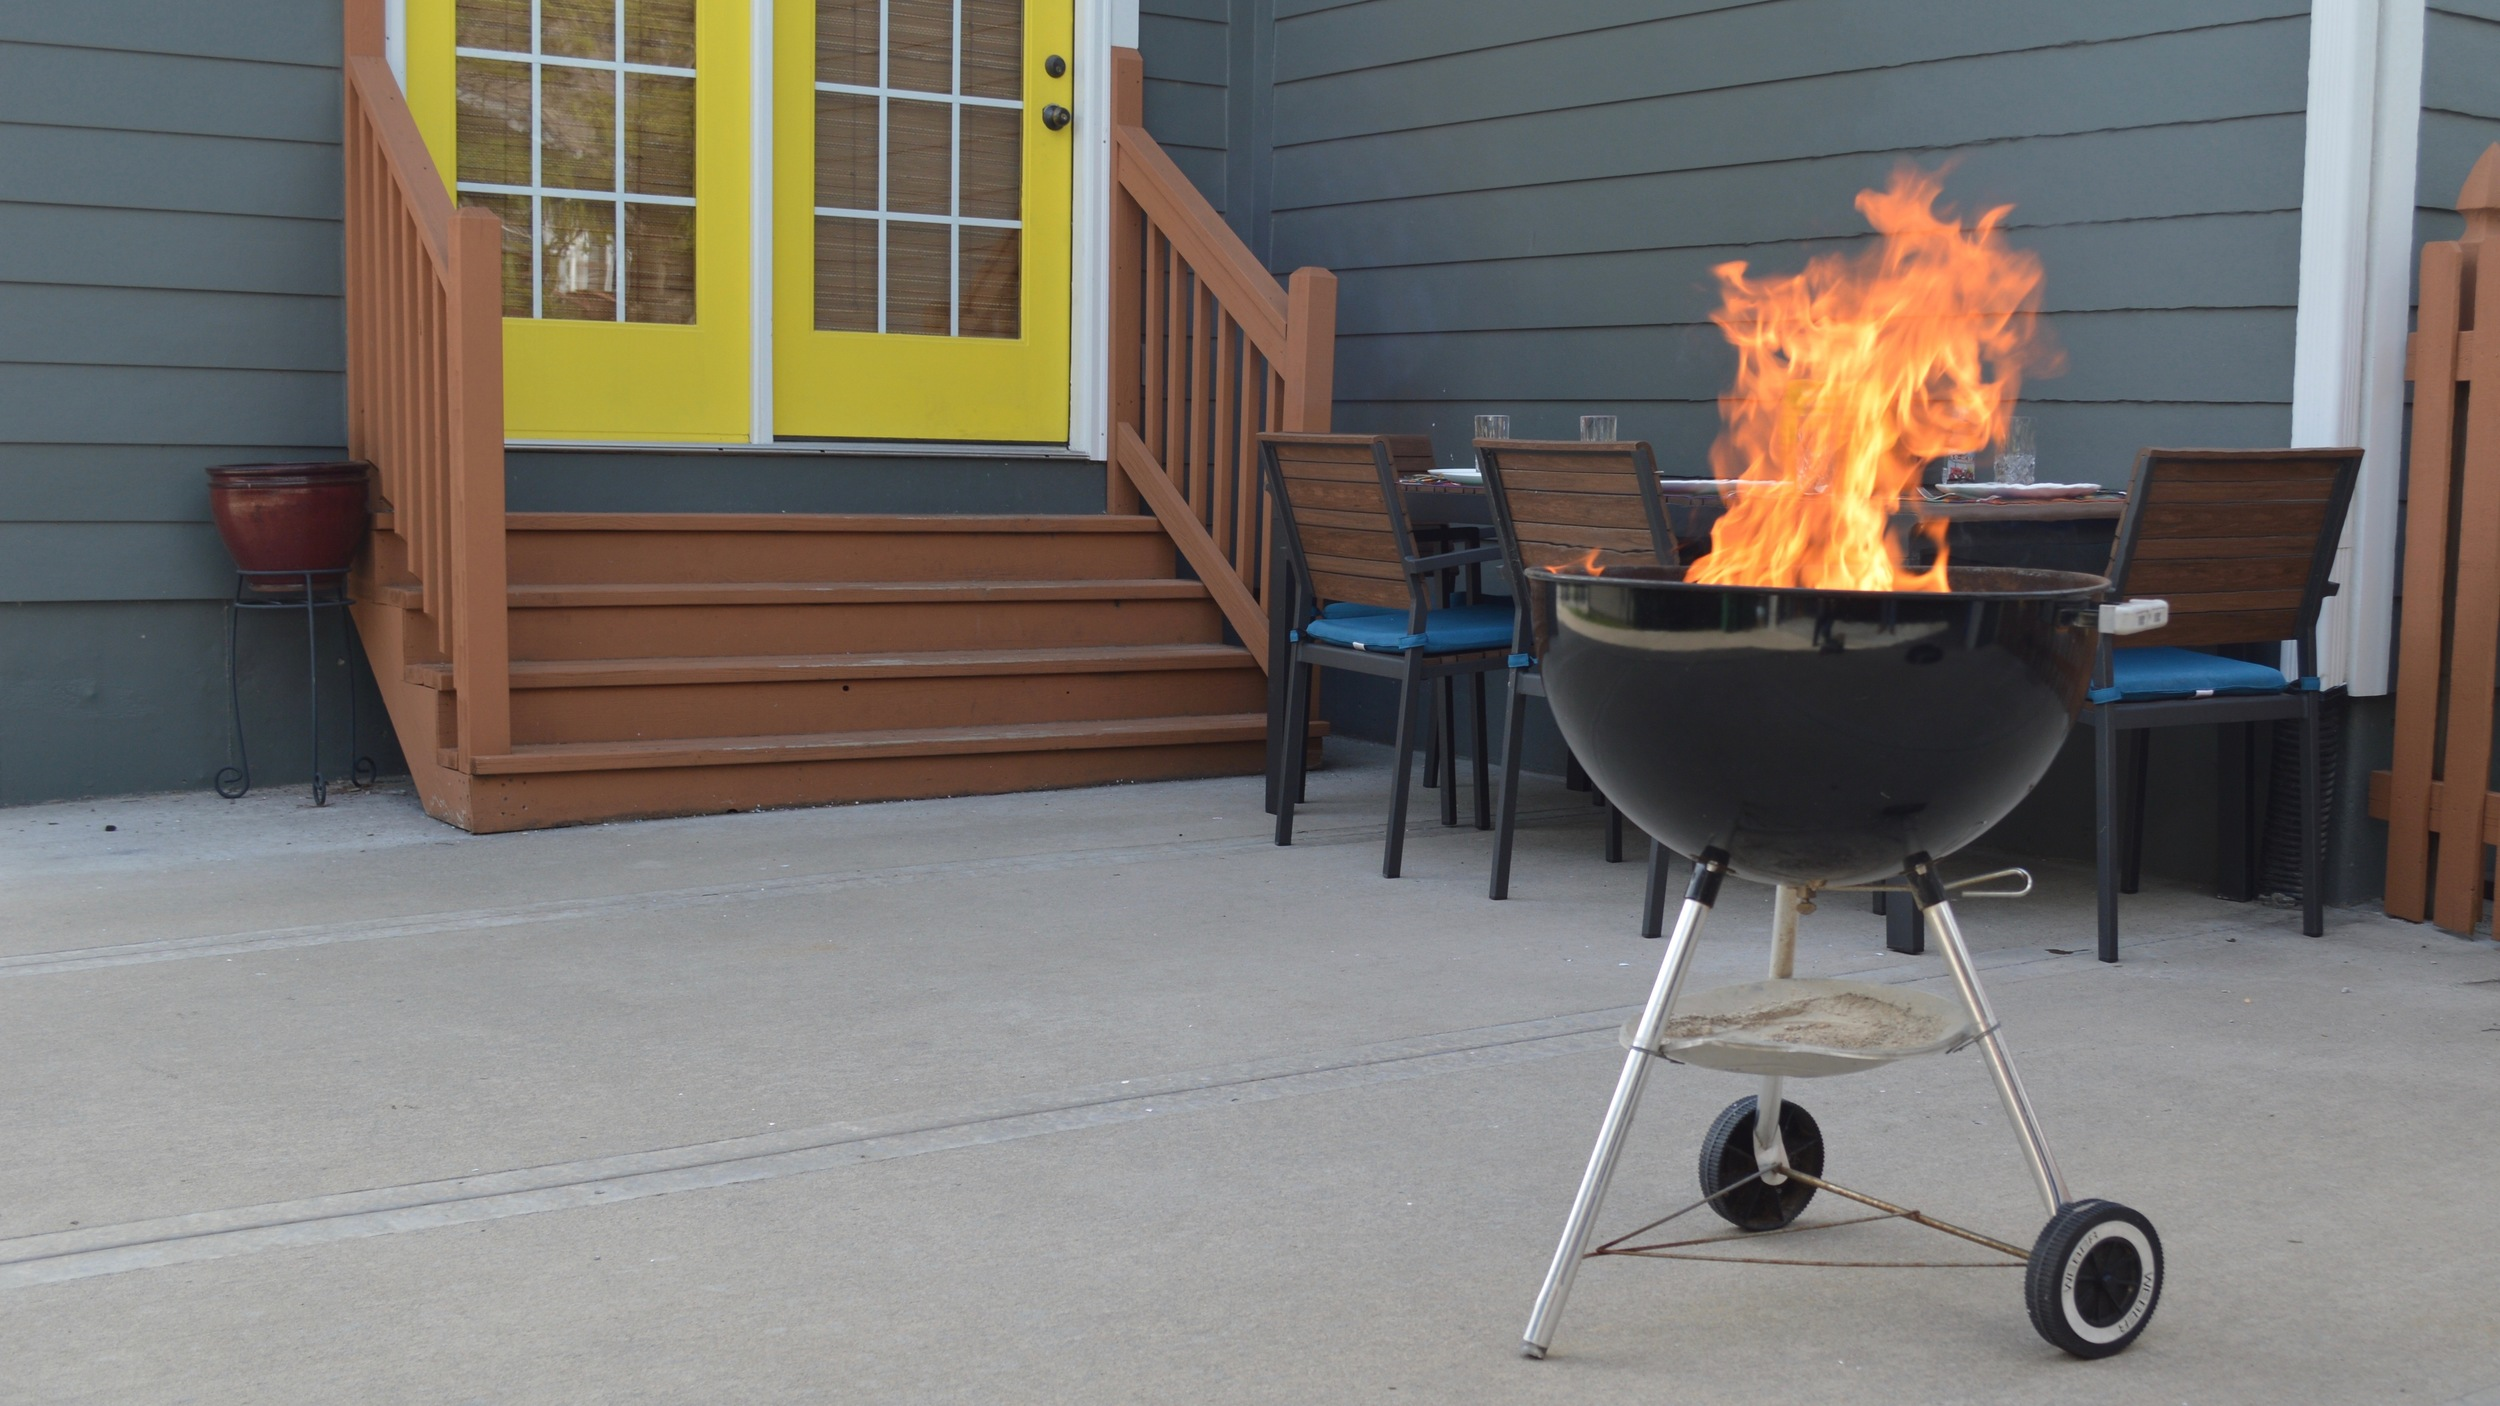 Grill fire2.jpg